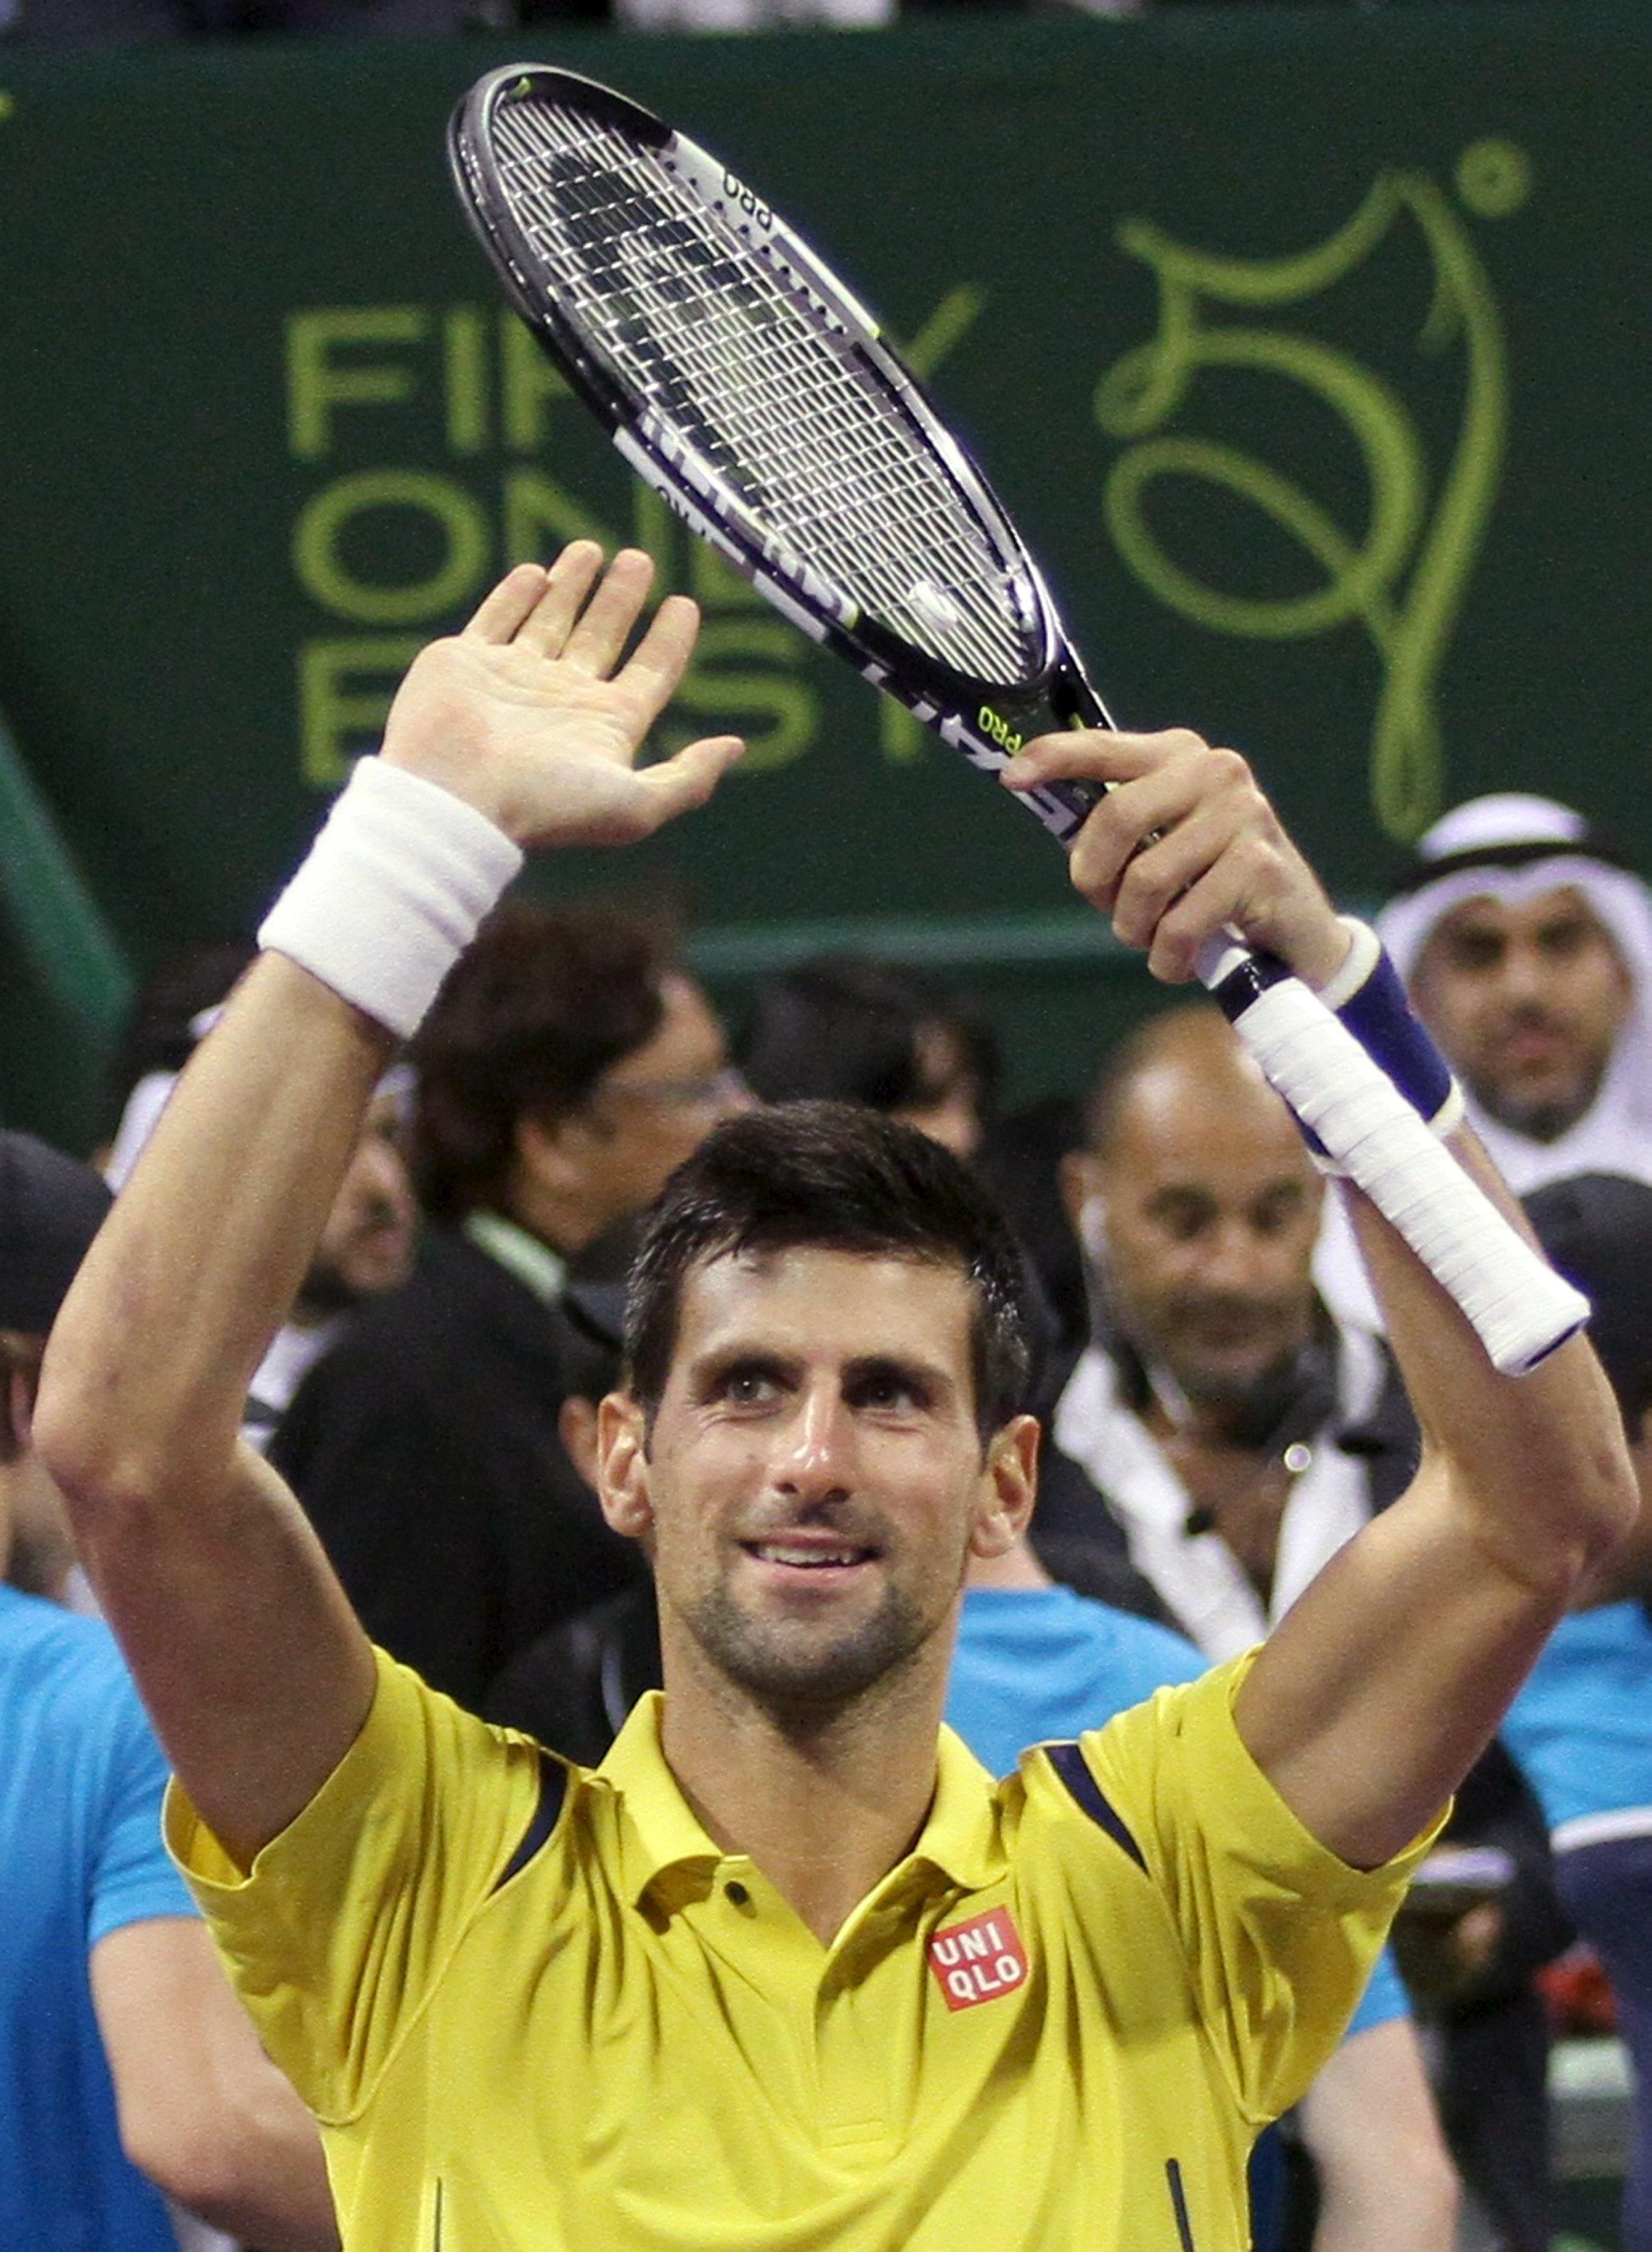 Novak Djokovic of Serbia celebrates after winning his Qatar Open men's single tennis final match against Rafael Nadal of Spain in Doha, Qatar, January 9, 2016. Photo: Reuters